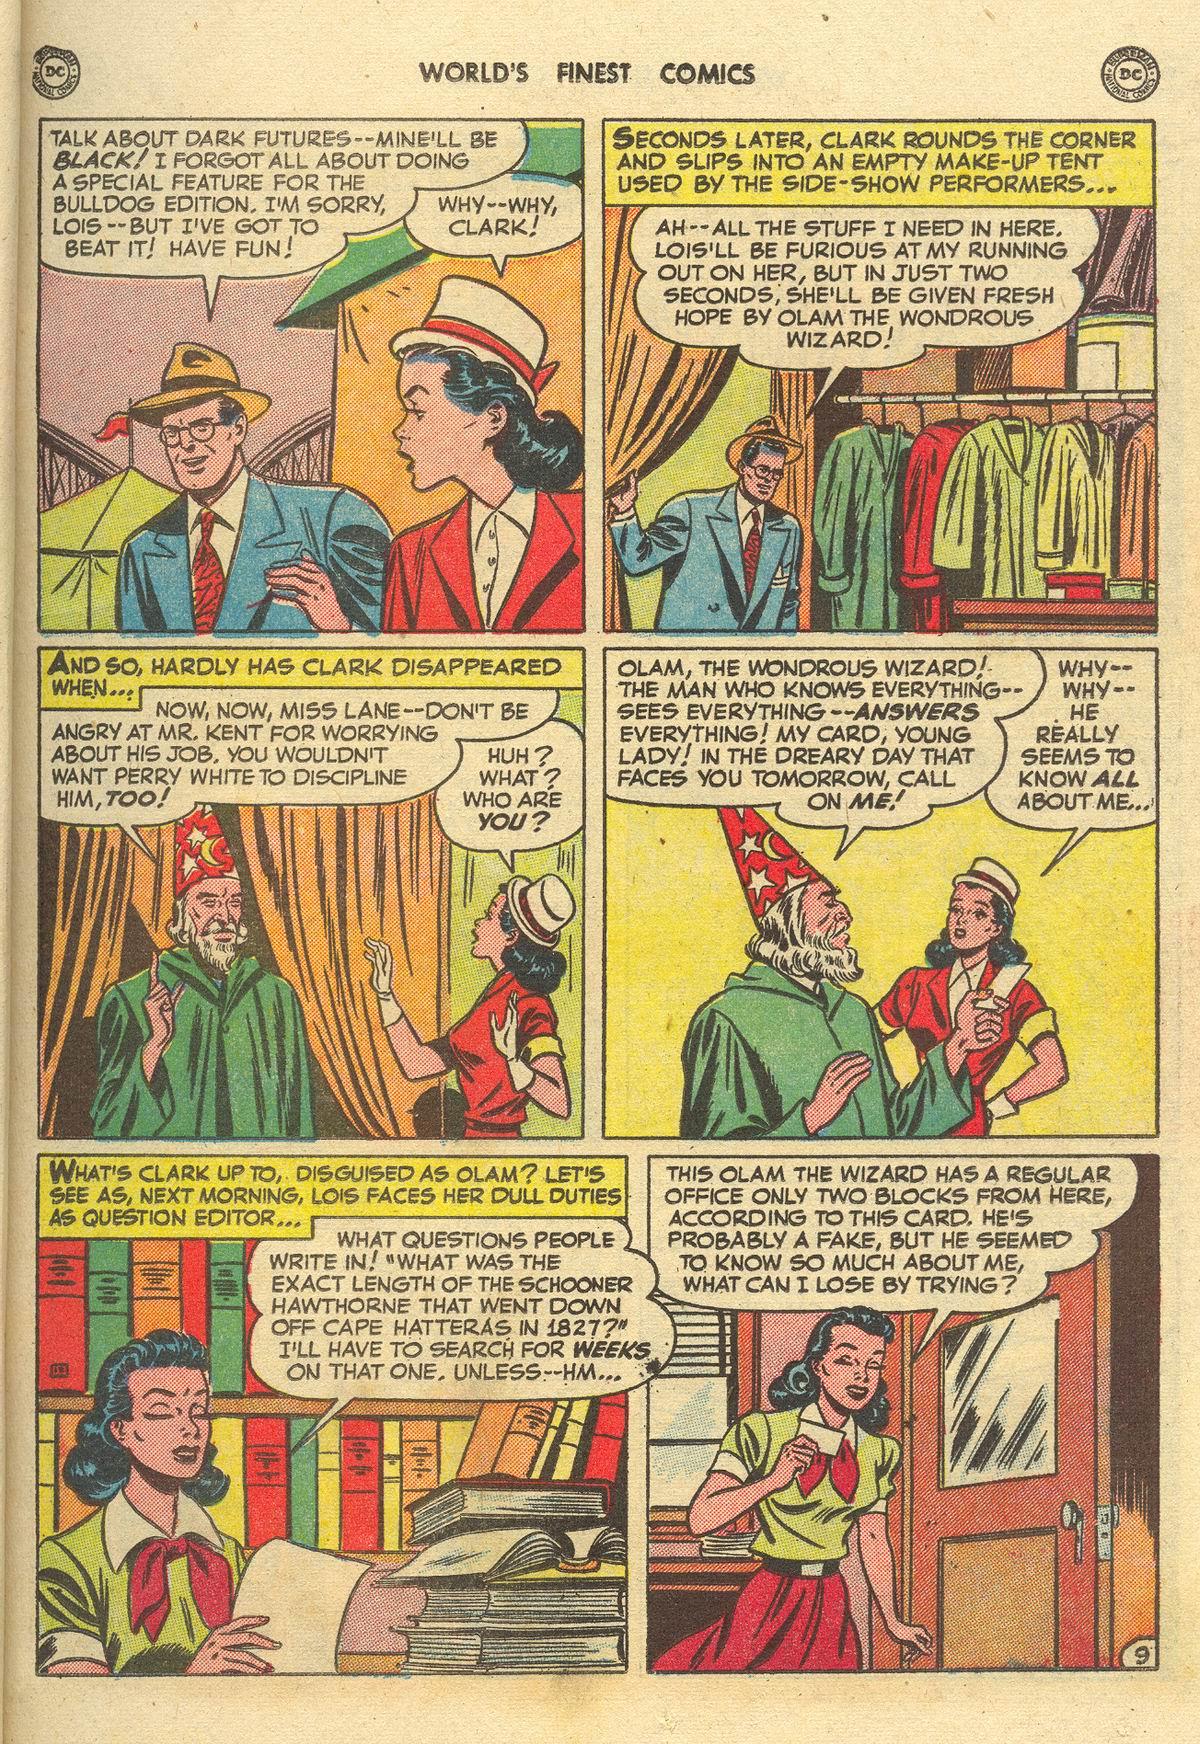 Read online World's Finest Comics comic -  Issue #51 - 11